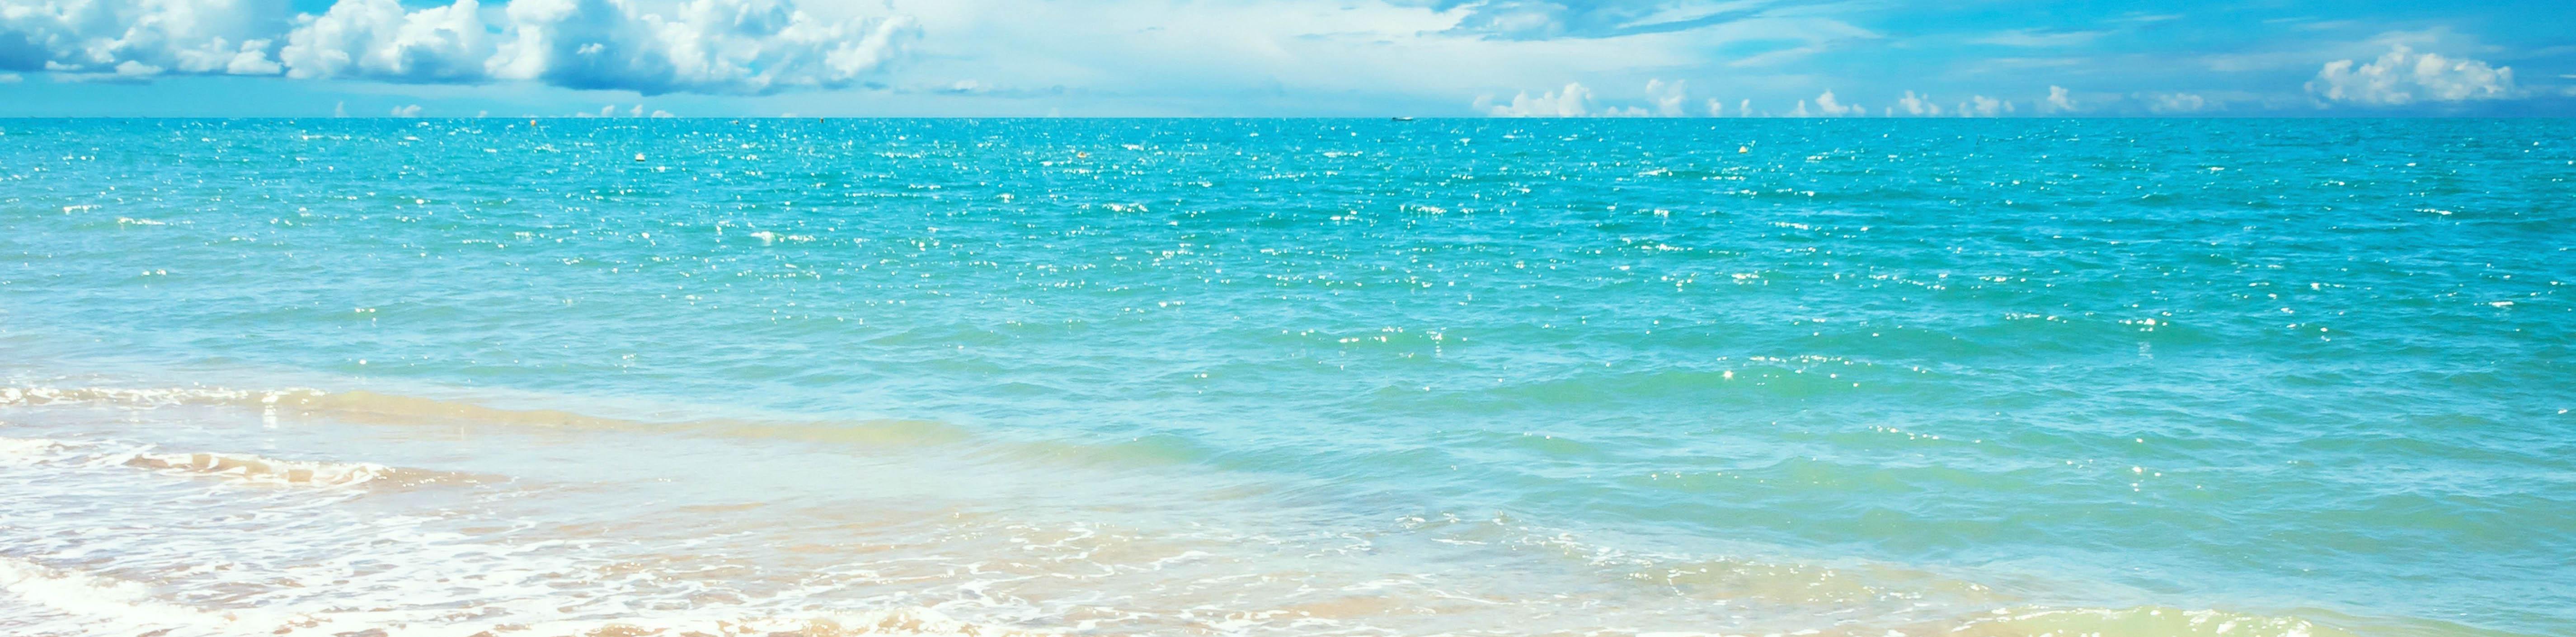 Ocean4